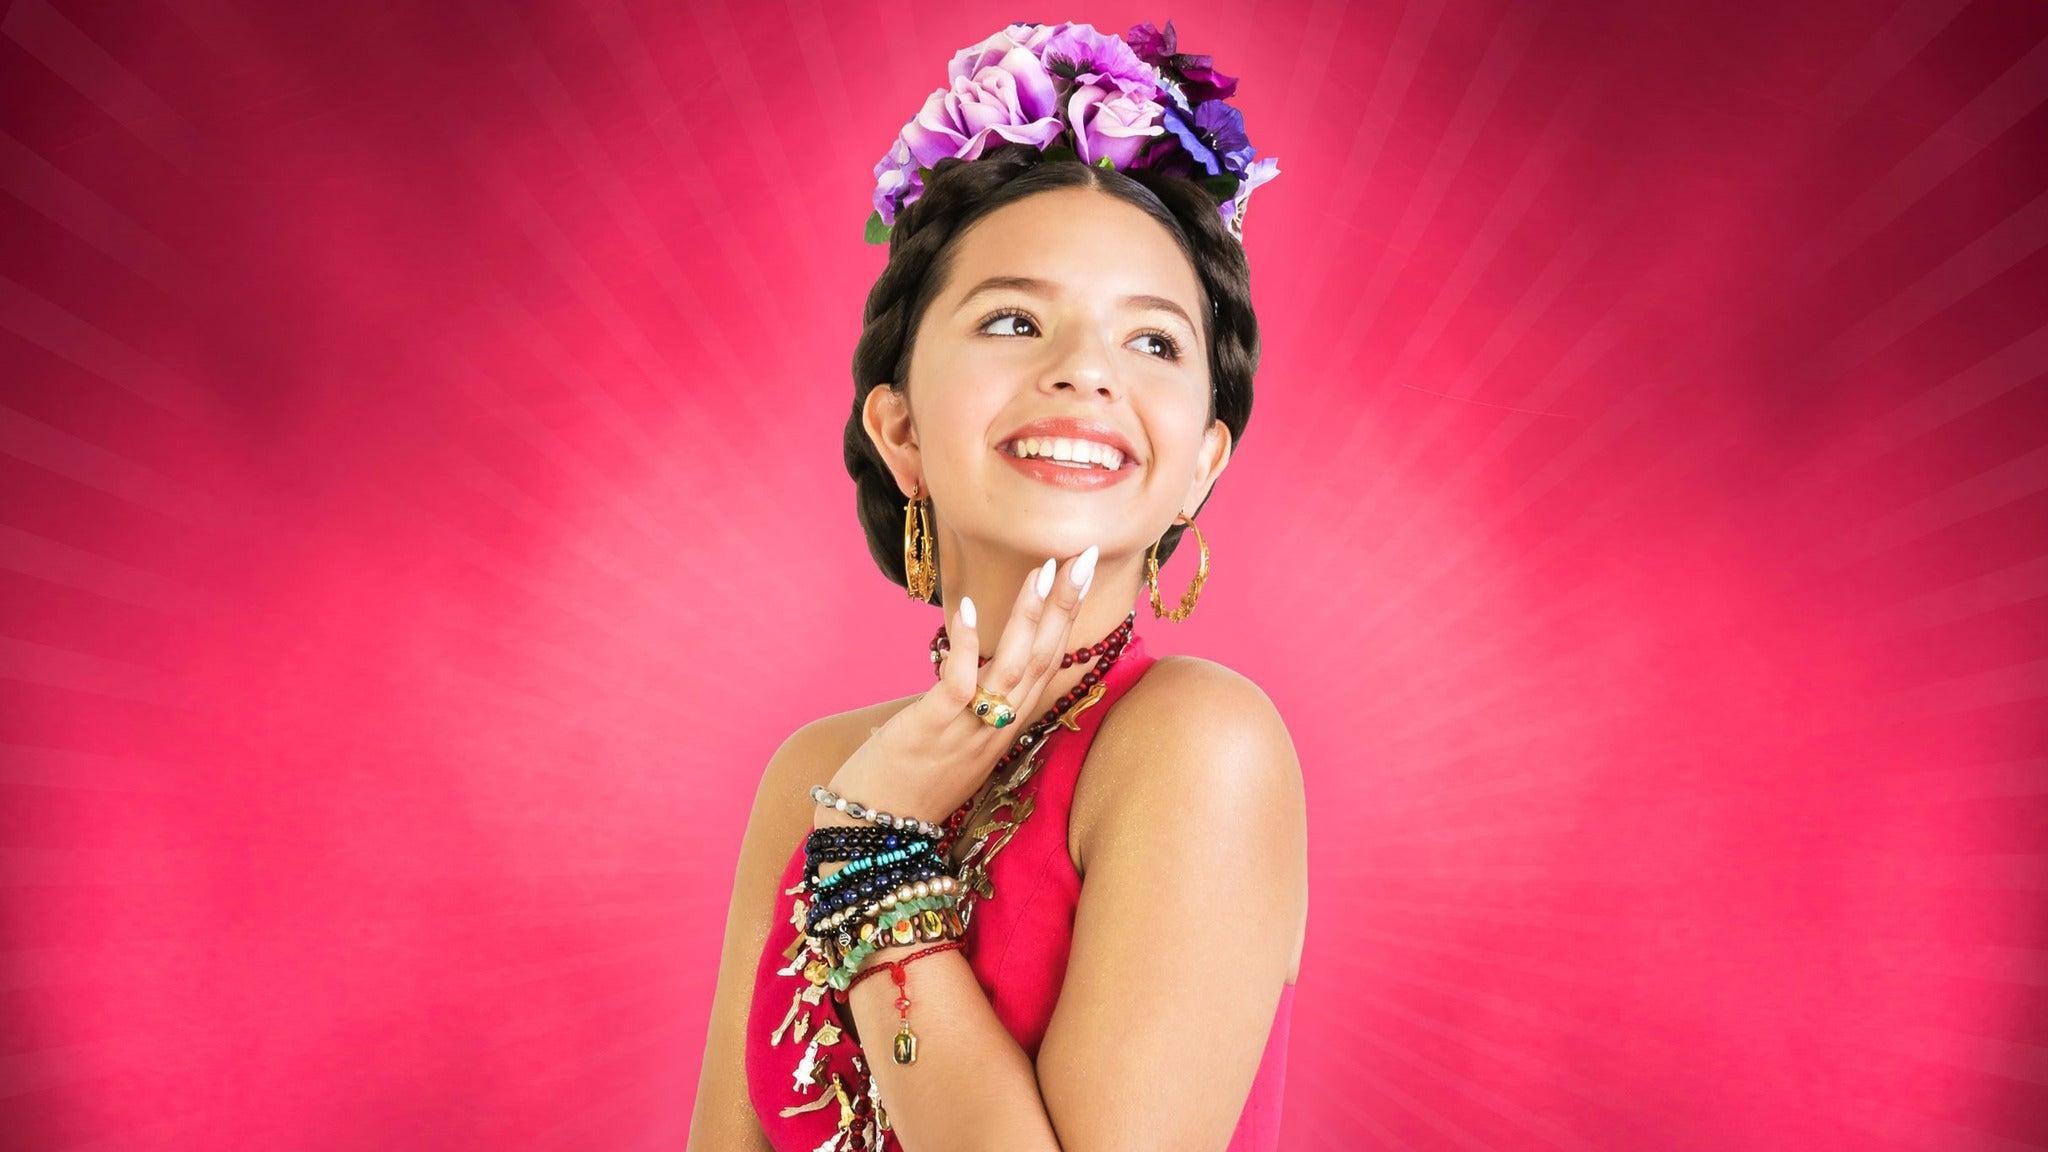 Angela Aguilar - Primero Soy Mexicana Tour